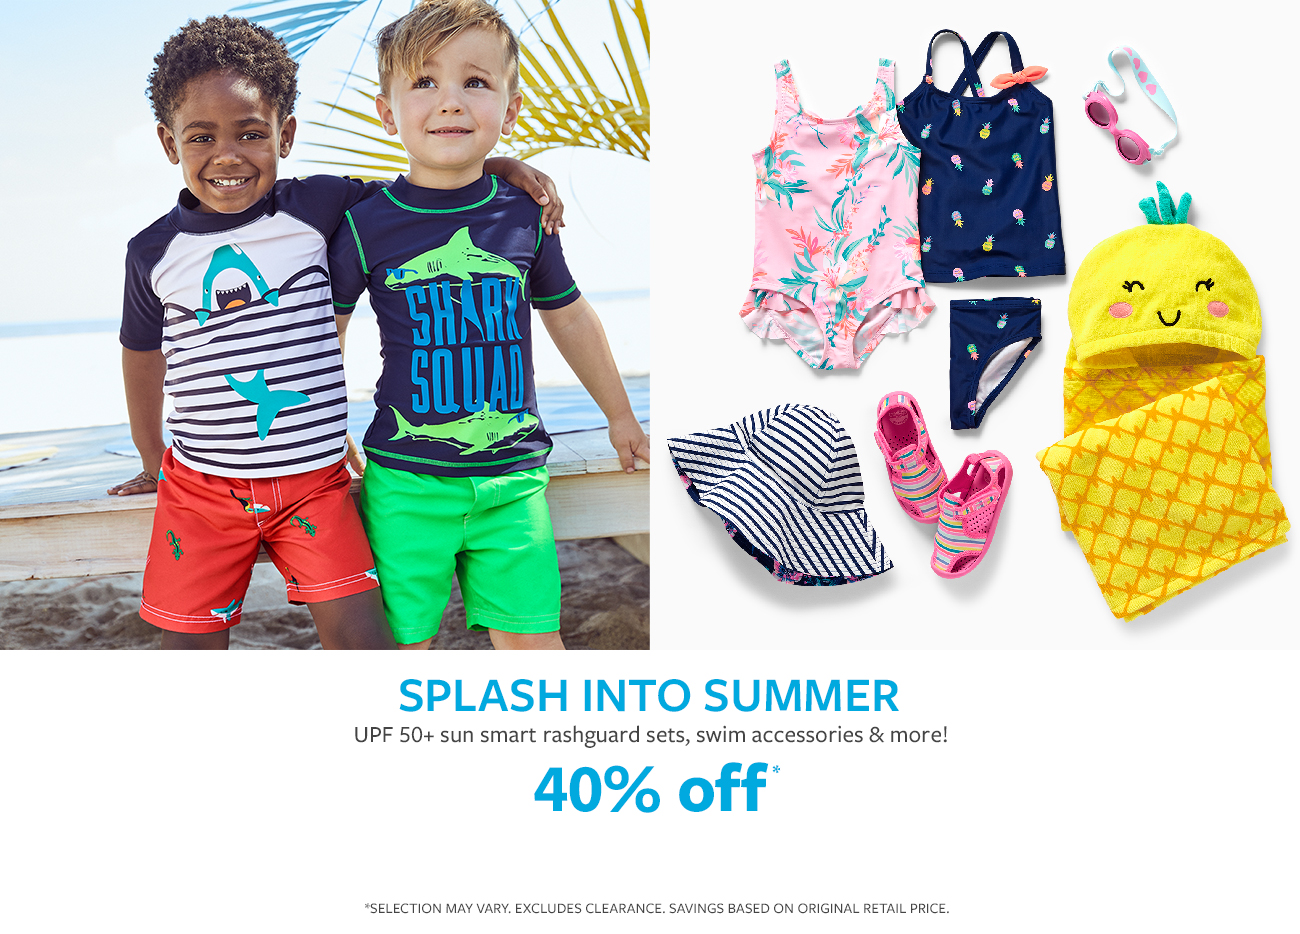 splash into summer | upf 50+ sun smart swimsuits, rashquard sets and more! 40% off*